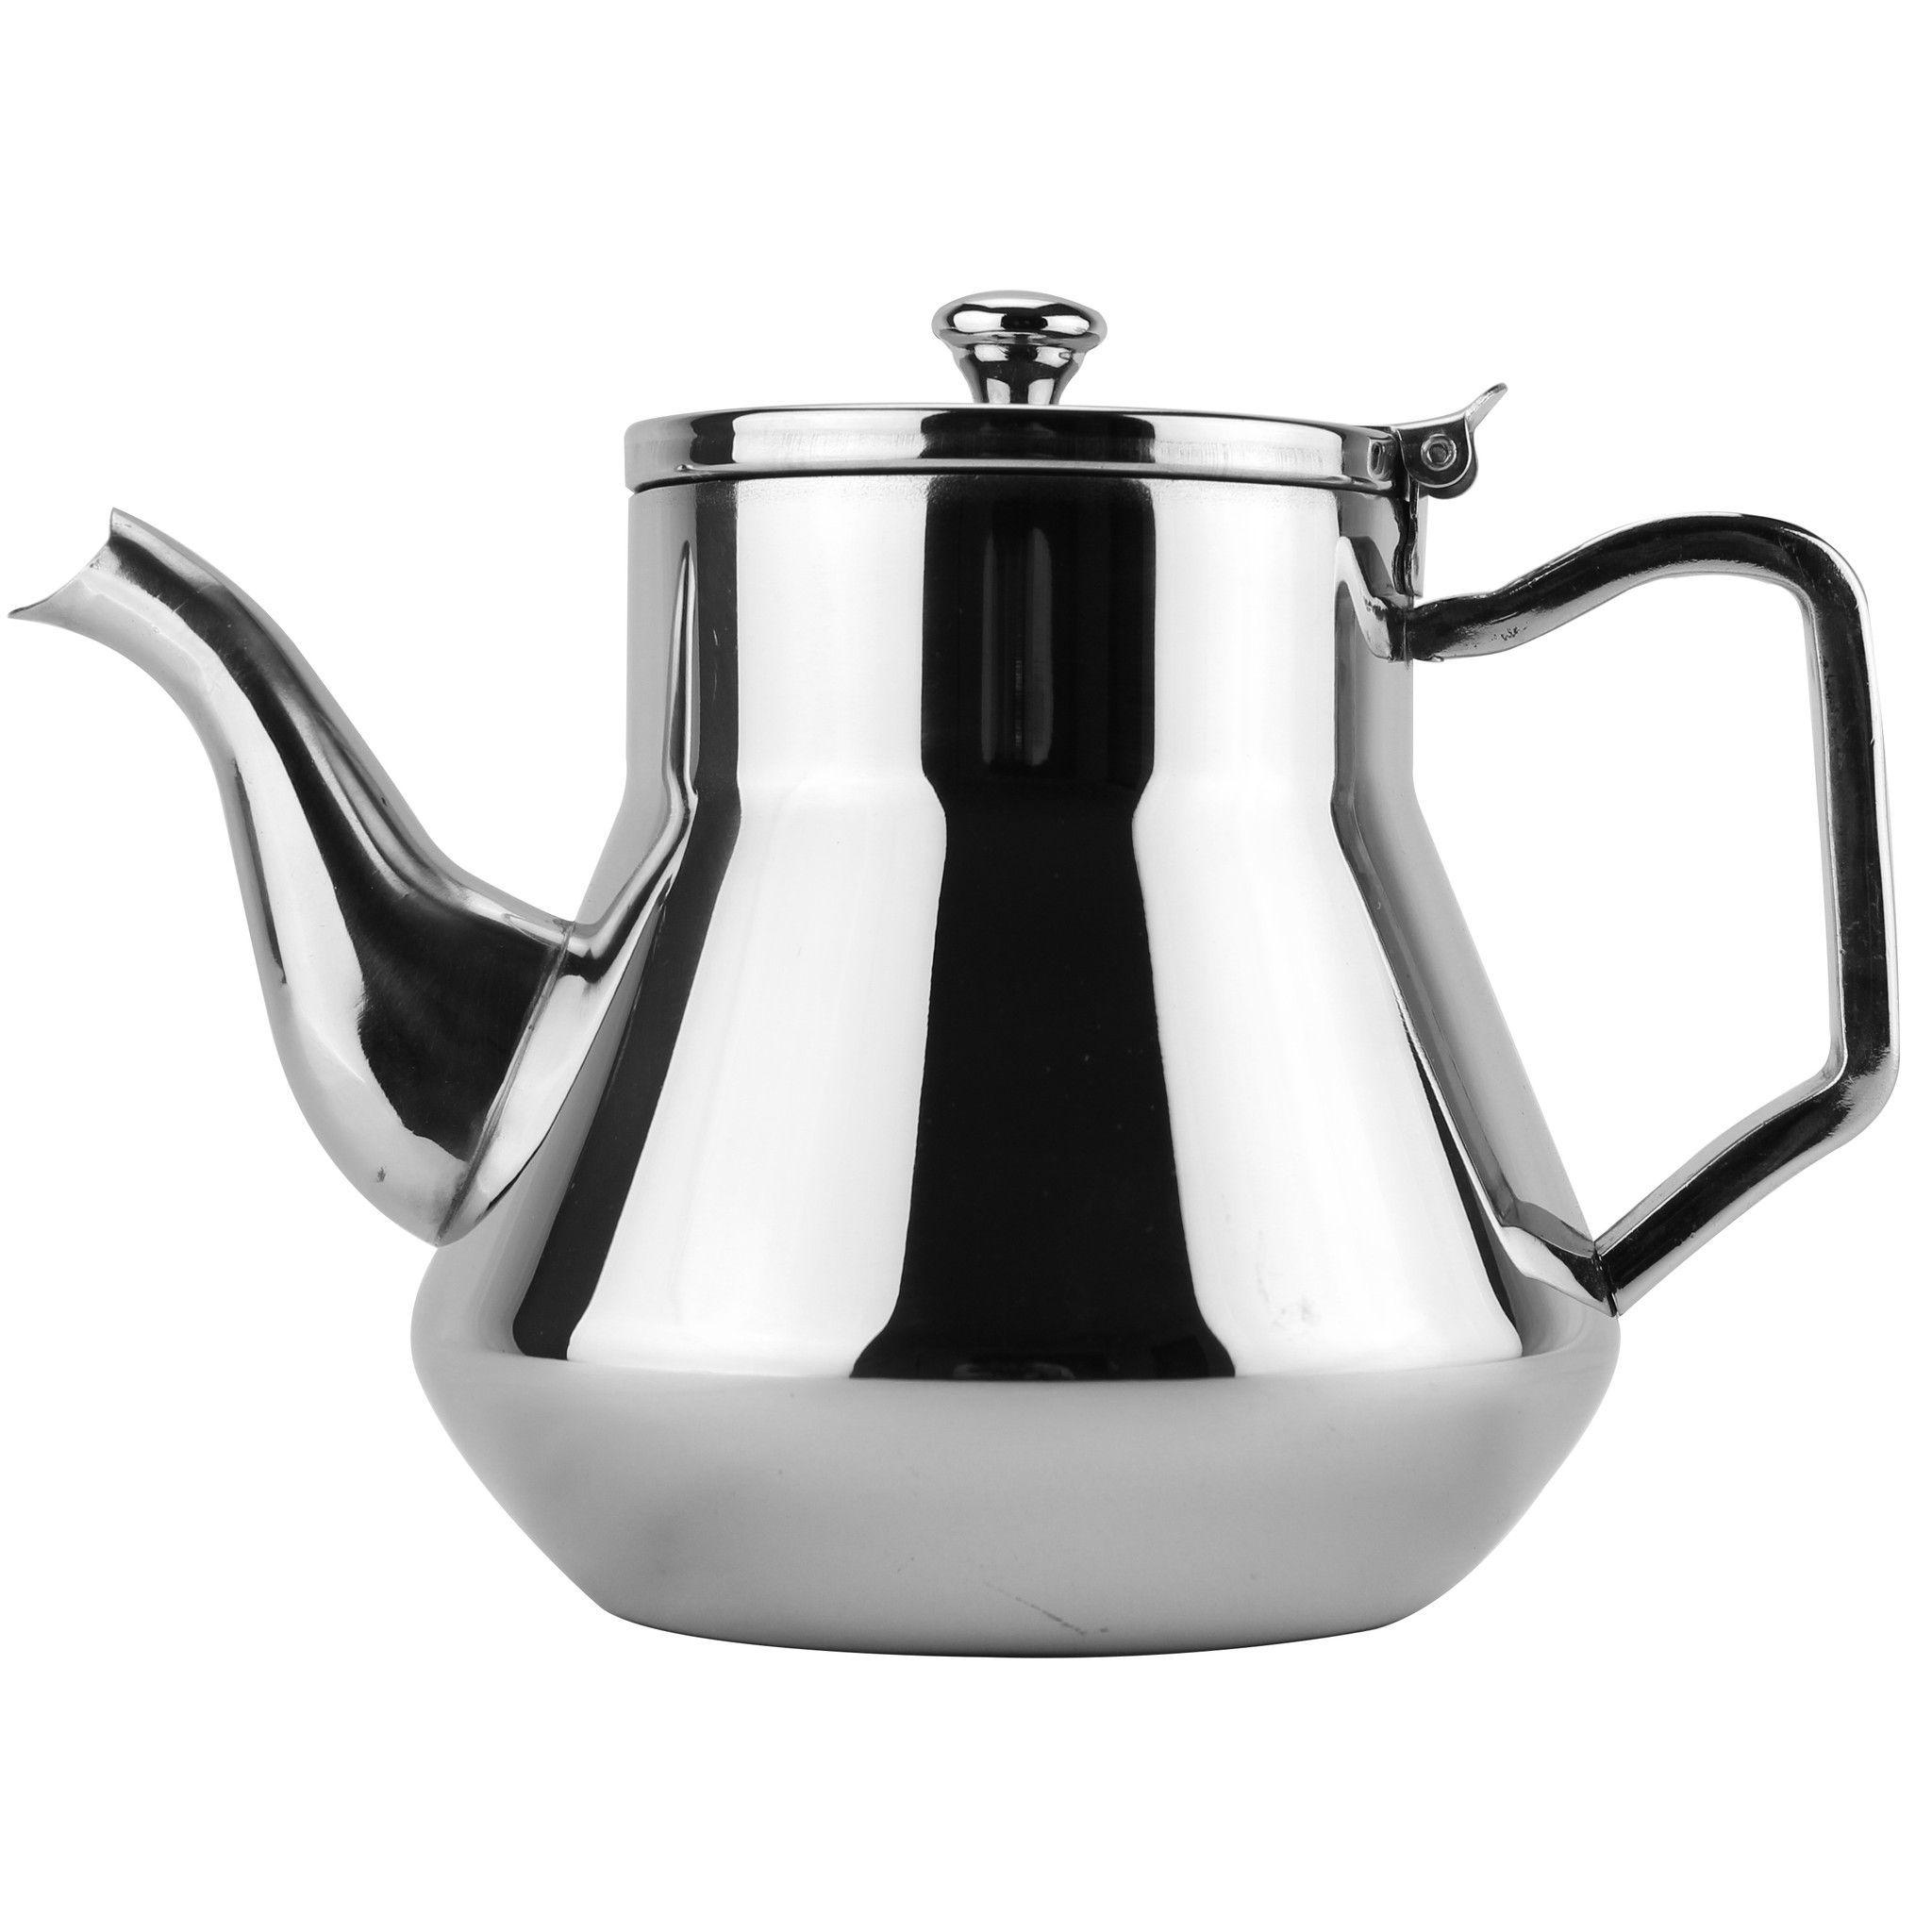 1.5 Liter Stainless Steel Teapot #GS-TPA2